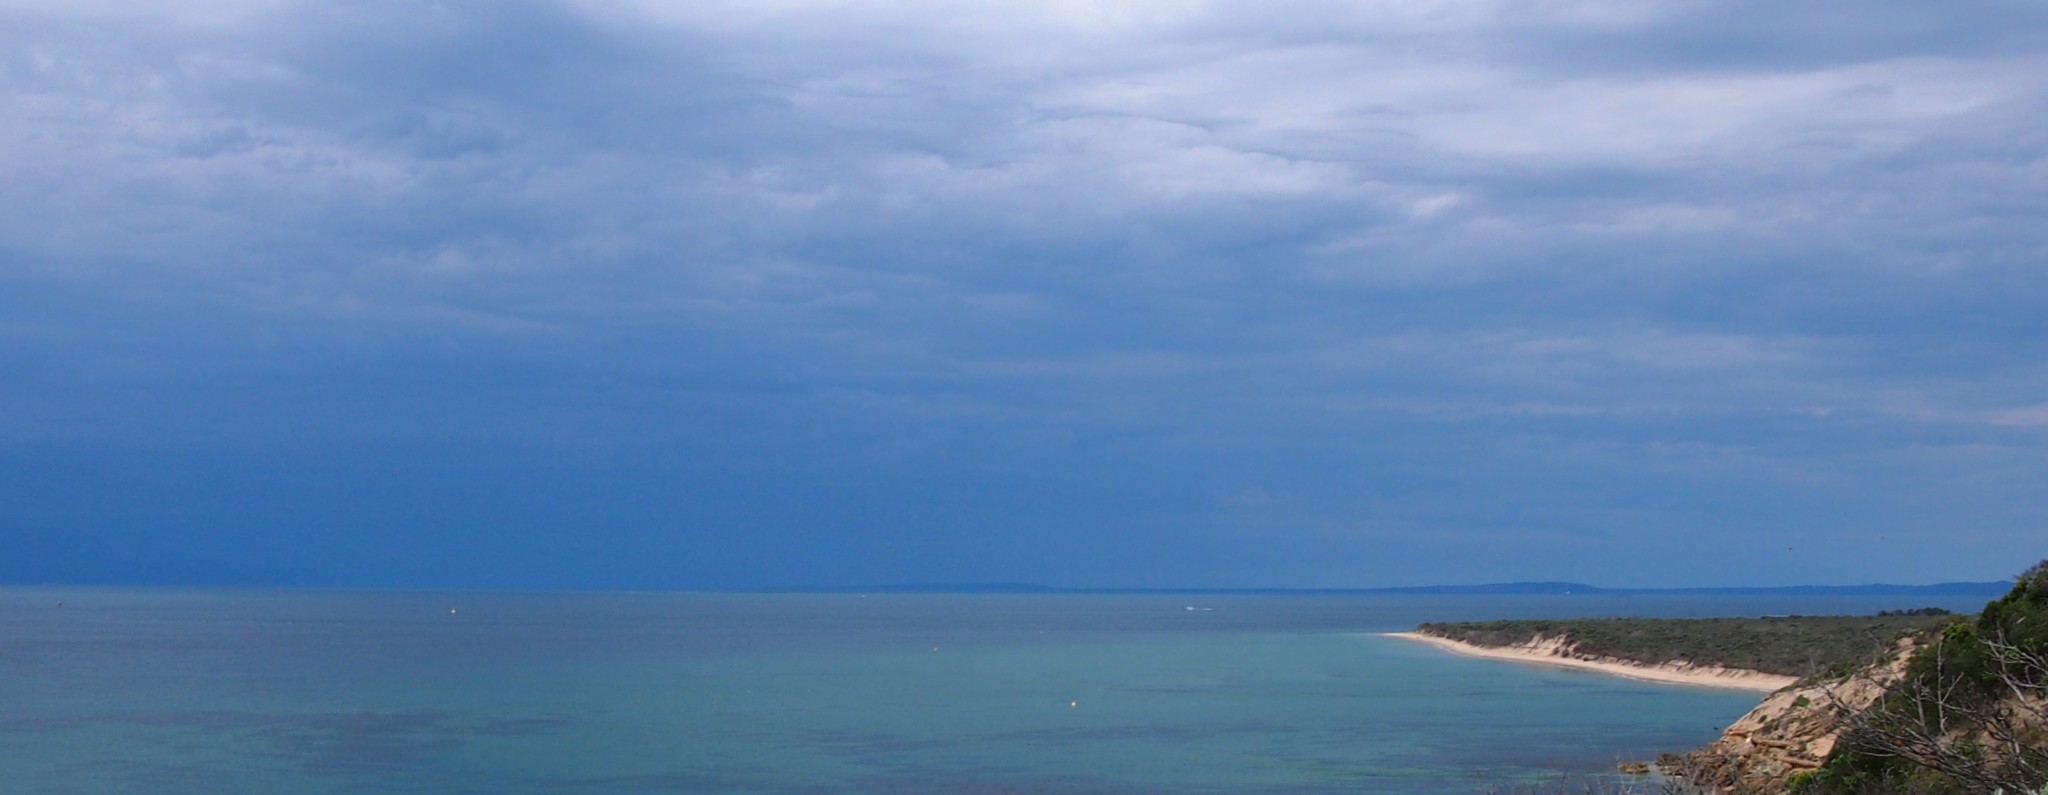 Point Nepean Portsea